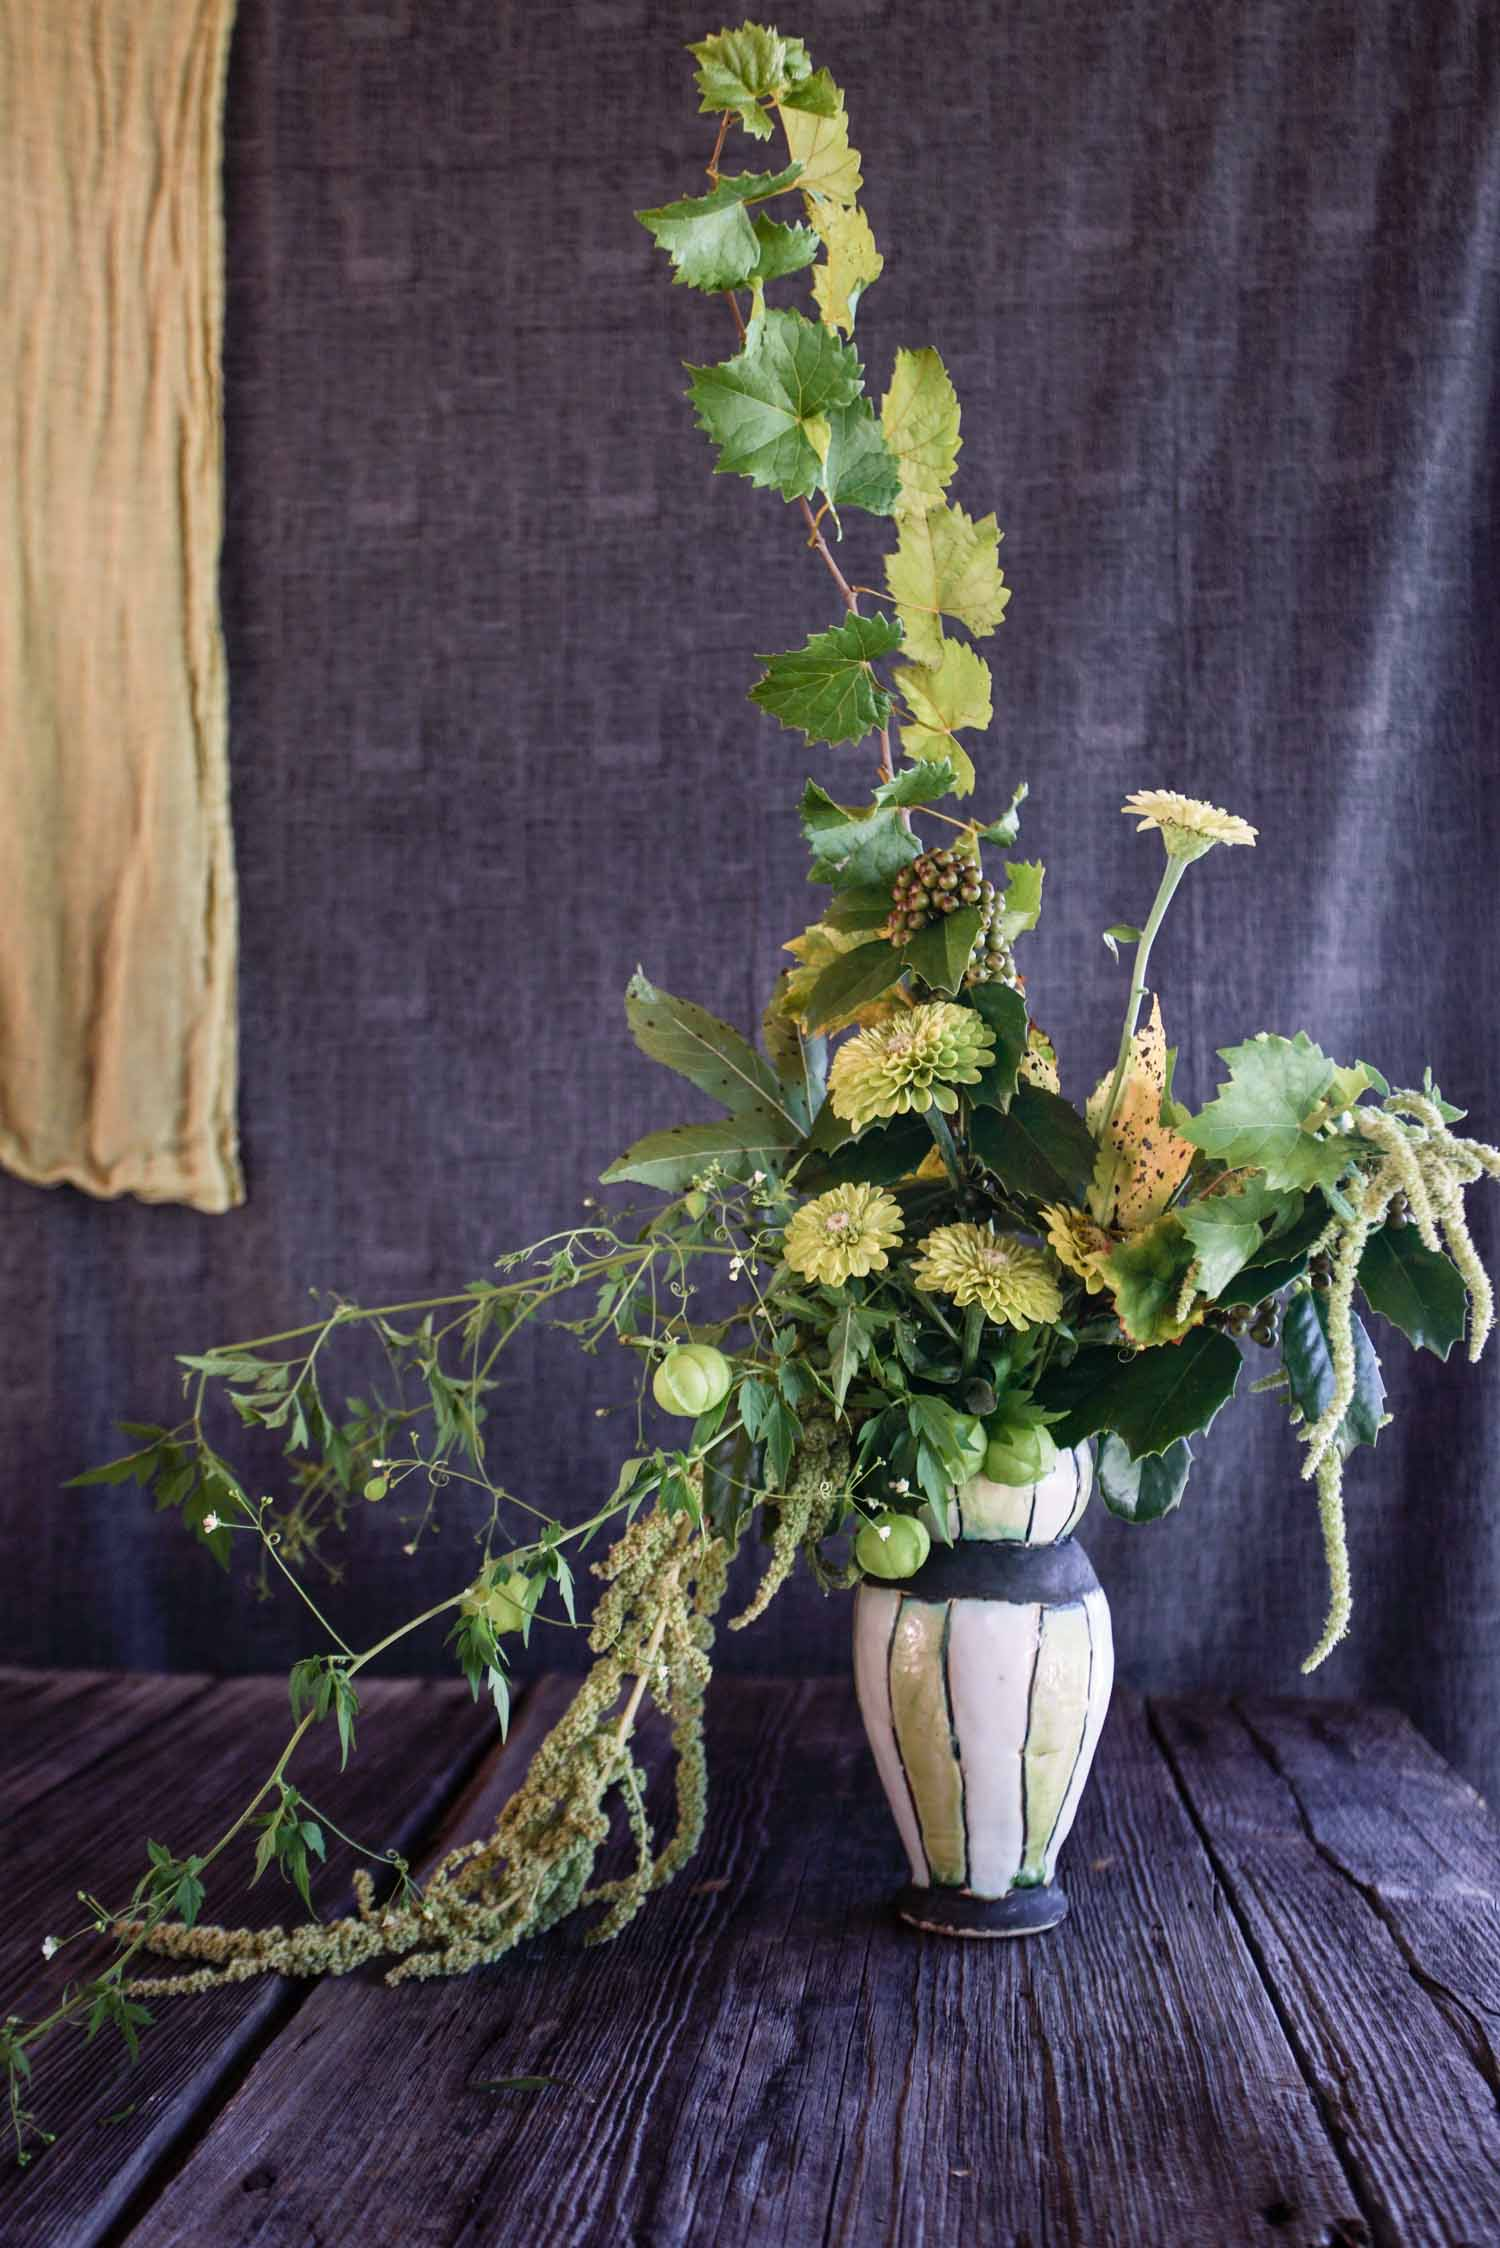 RA_3 porch farm 2016 flower social-2016101709100.jpg